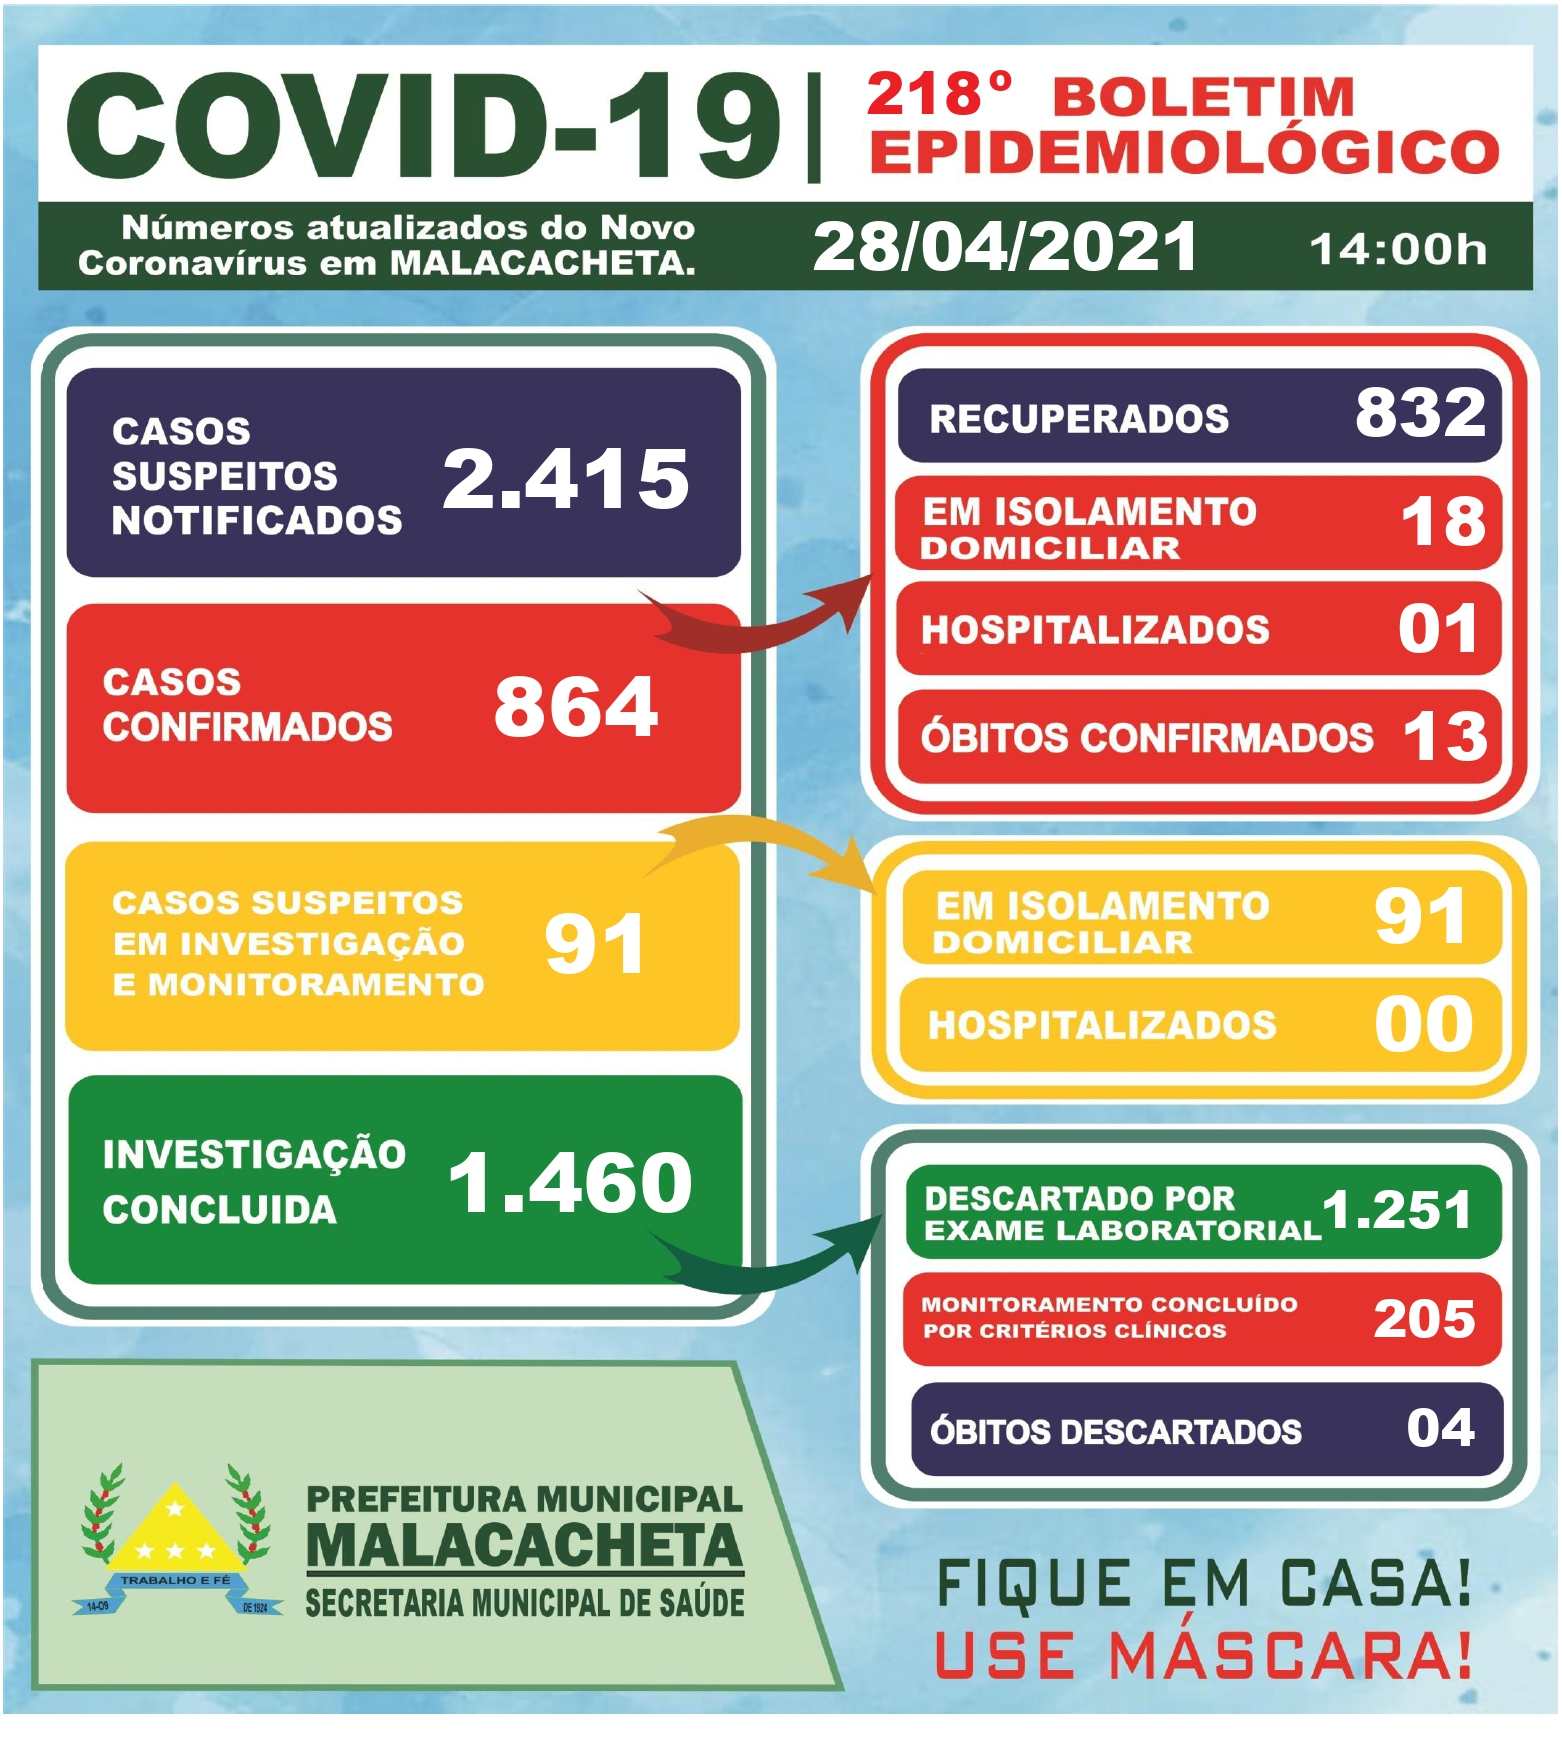 BOLETIM OFICIAL CORONAVÍRUS 28 DE ABRIL DE 2021